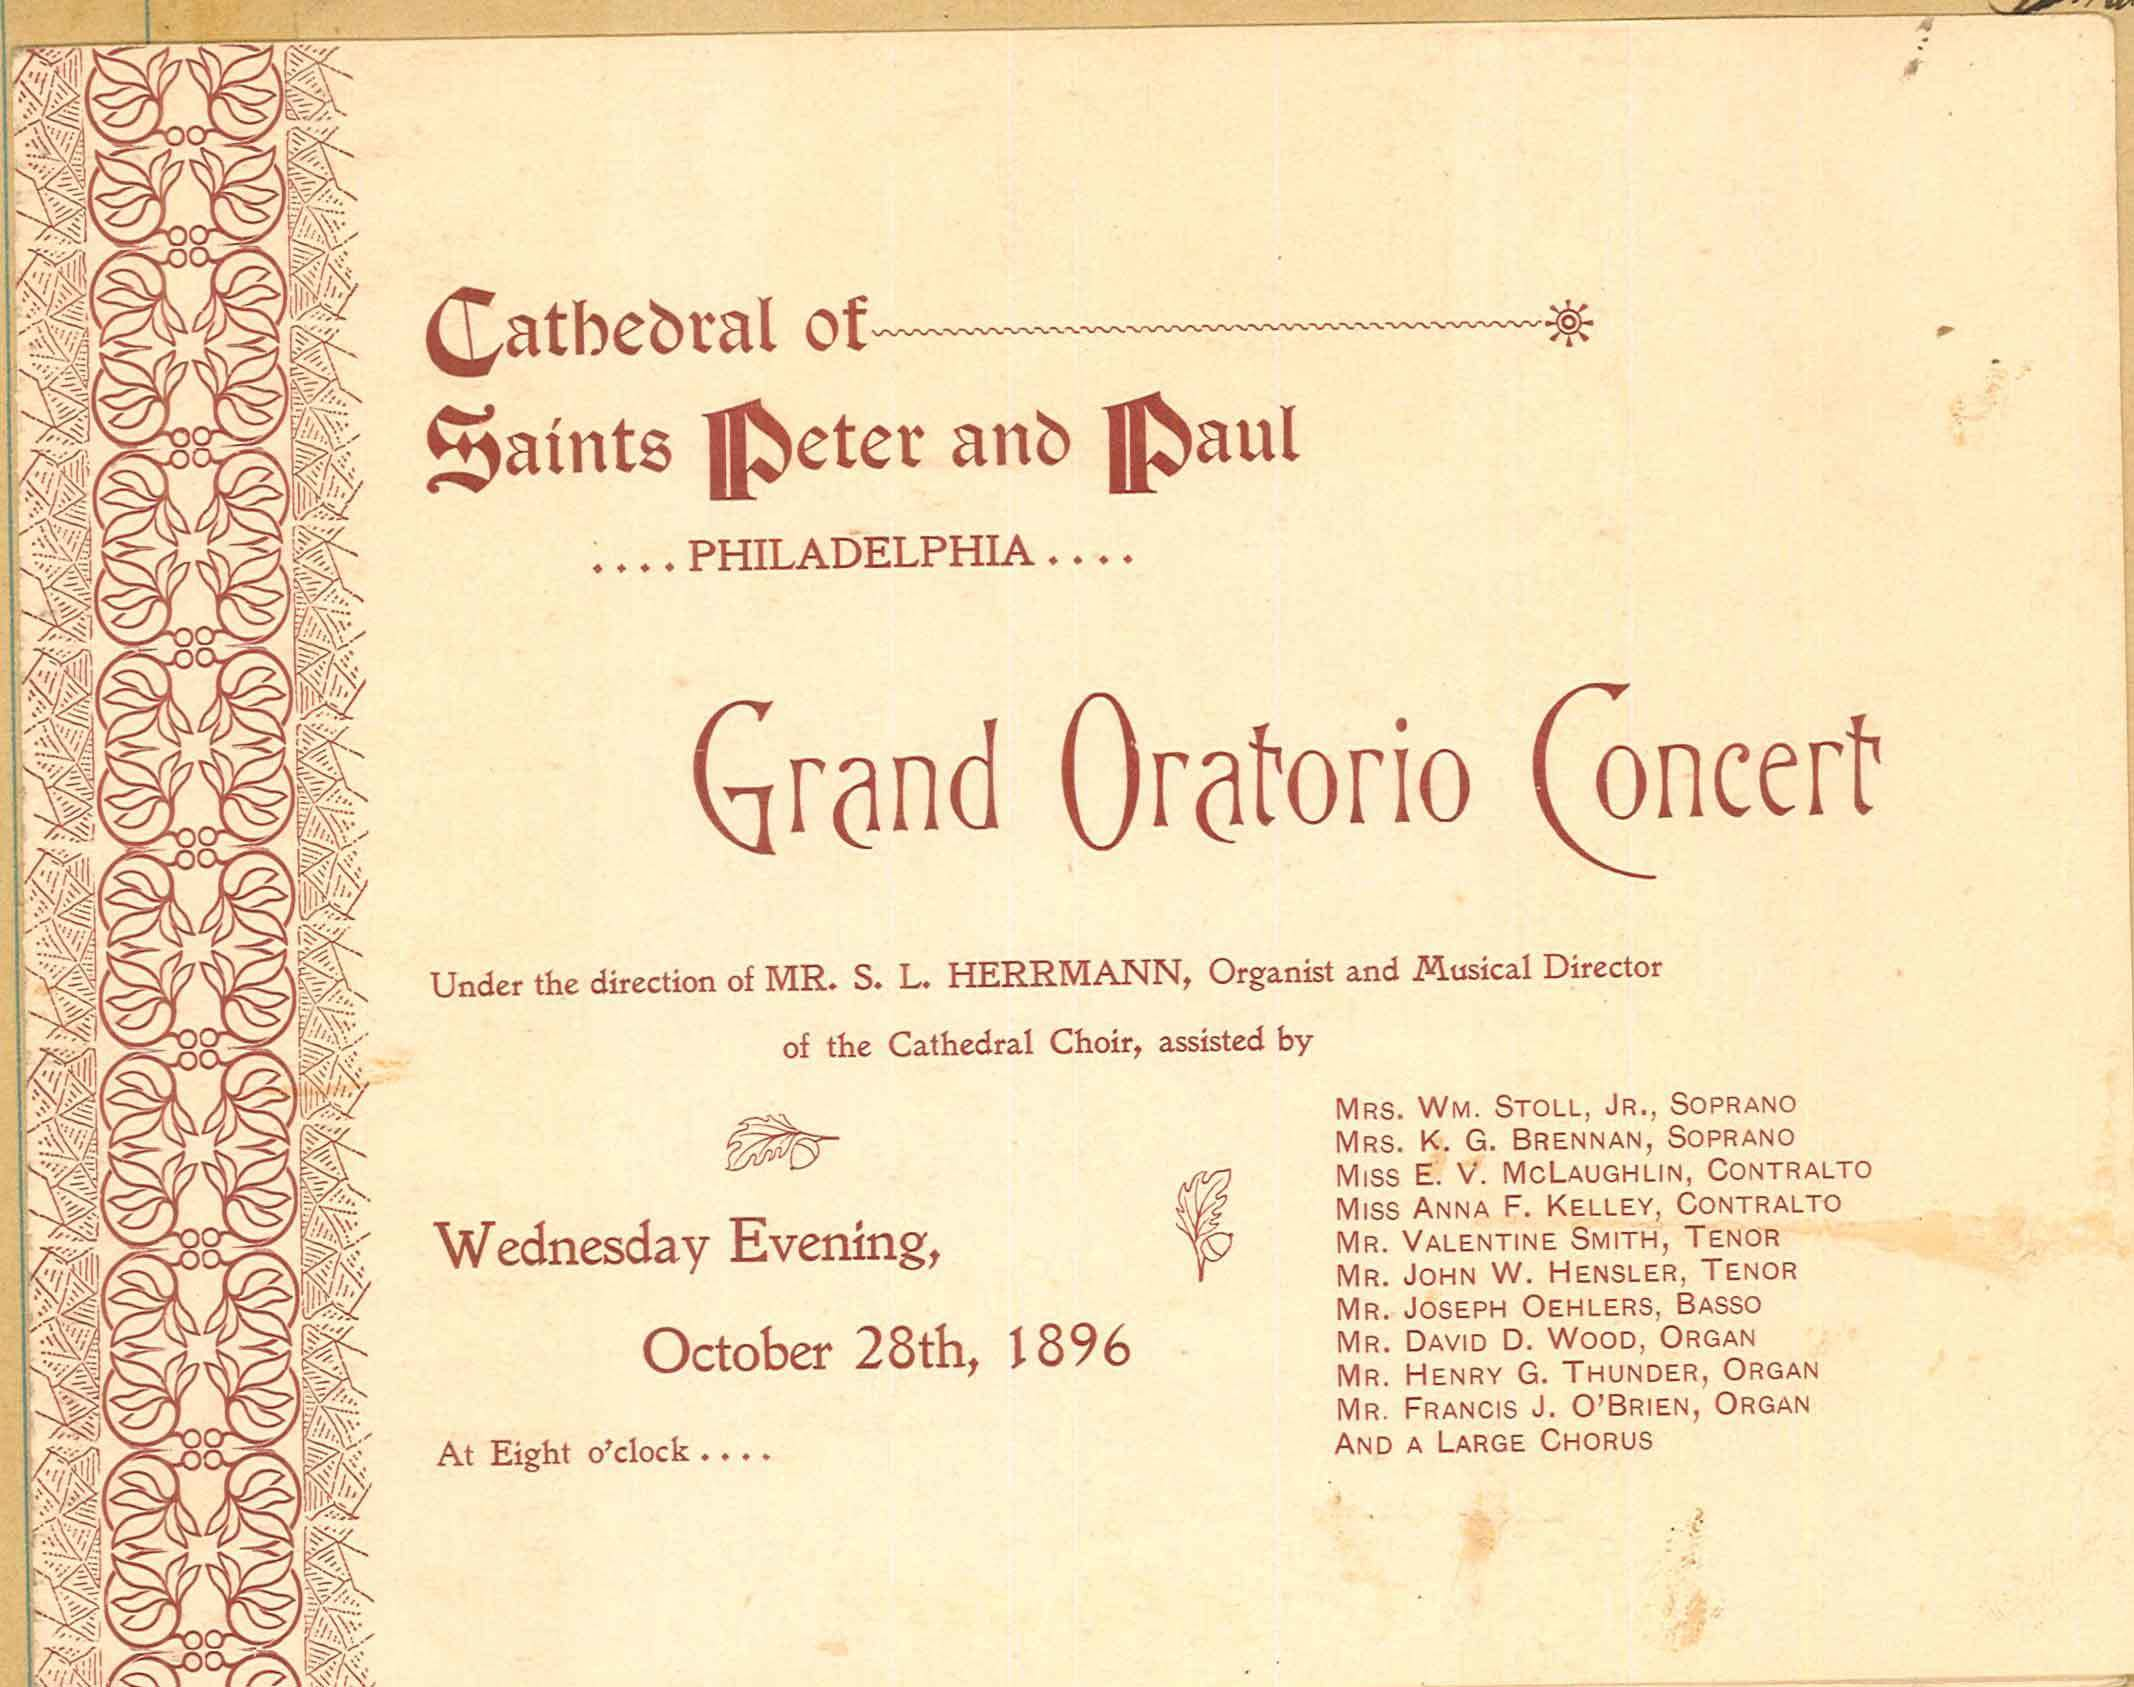 Grand Oratorio Concert Program